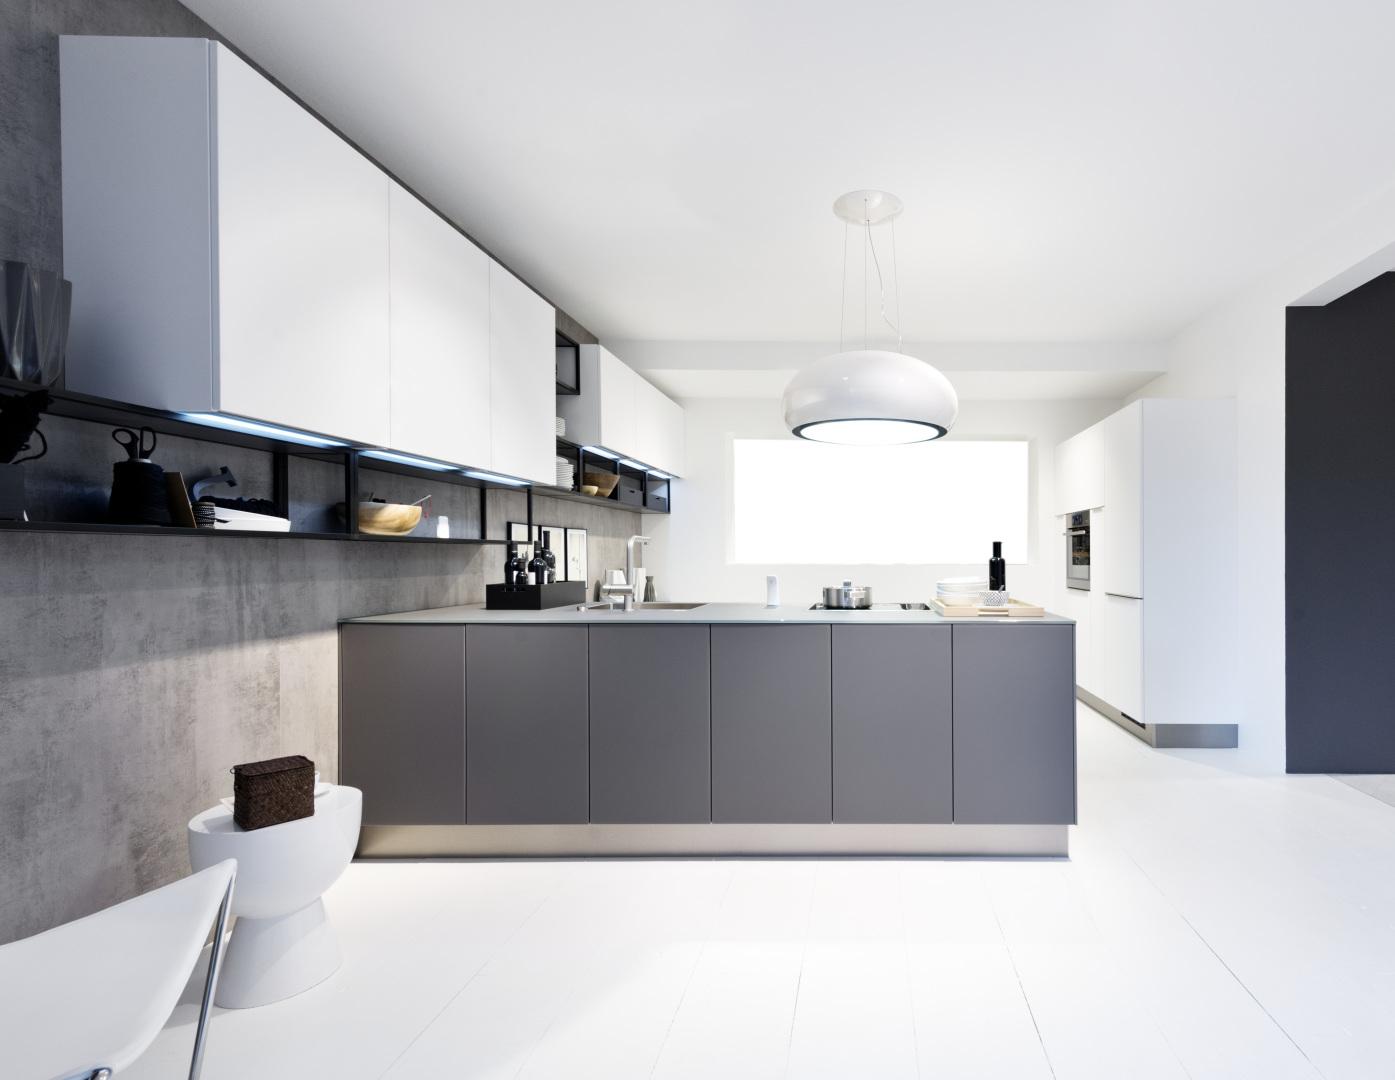 glas tec satin interio. Black Bedroom Furniture Sets. Home Design Ideas